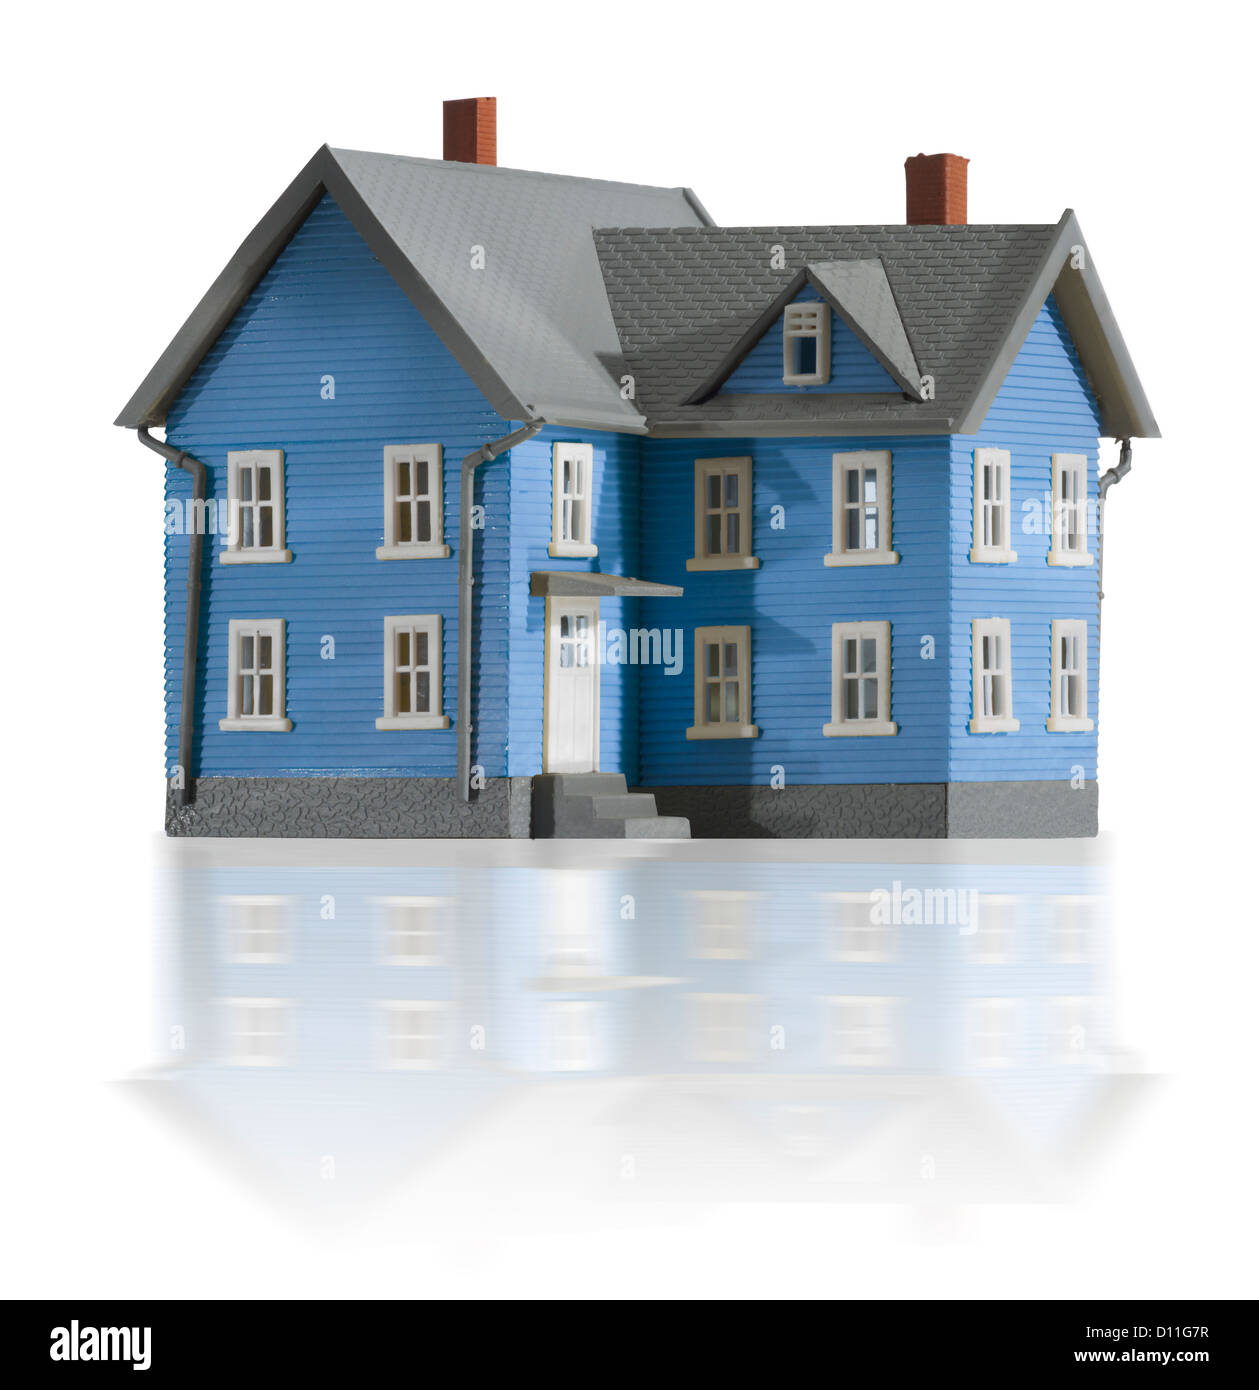 Gray and blue miniature farm house - Stock Image